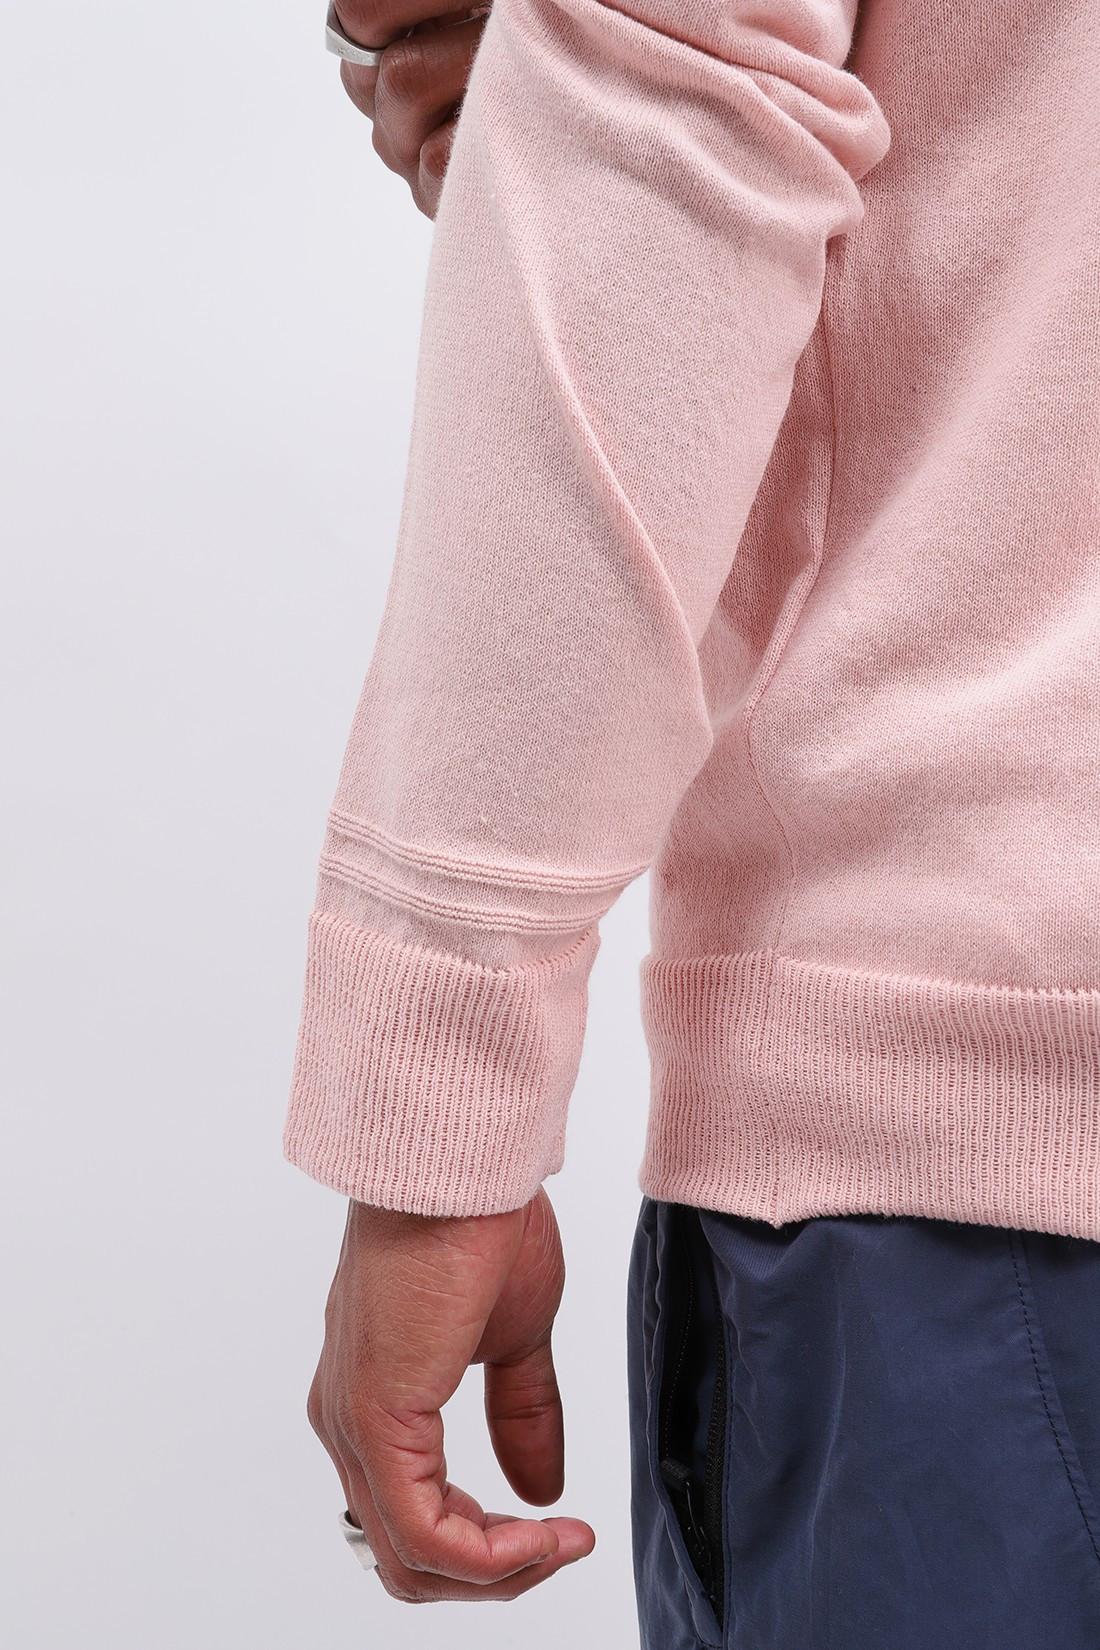 STONE ISLAND / 571b9 pocket knitwear v0082 Rosa antico